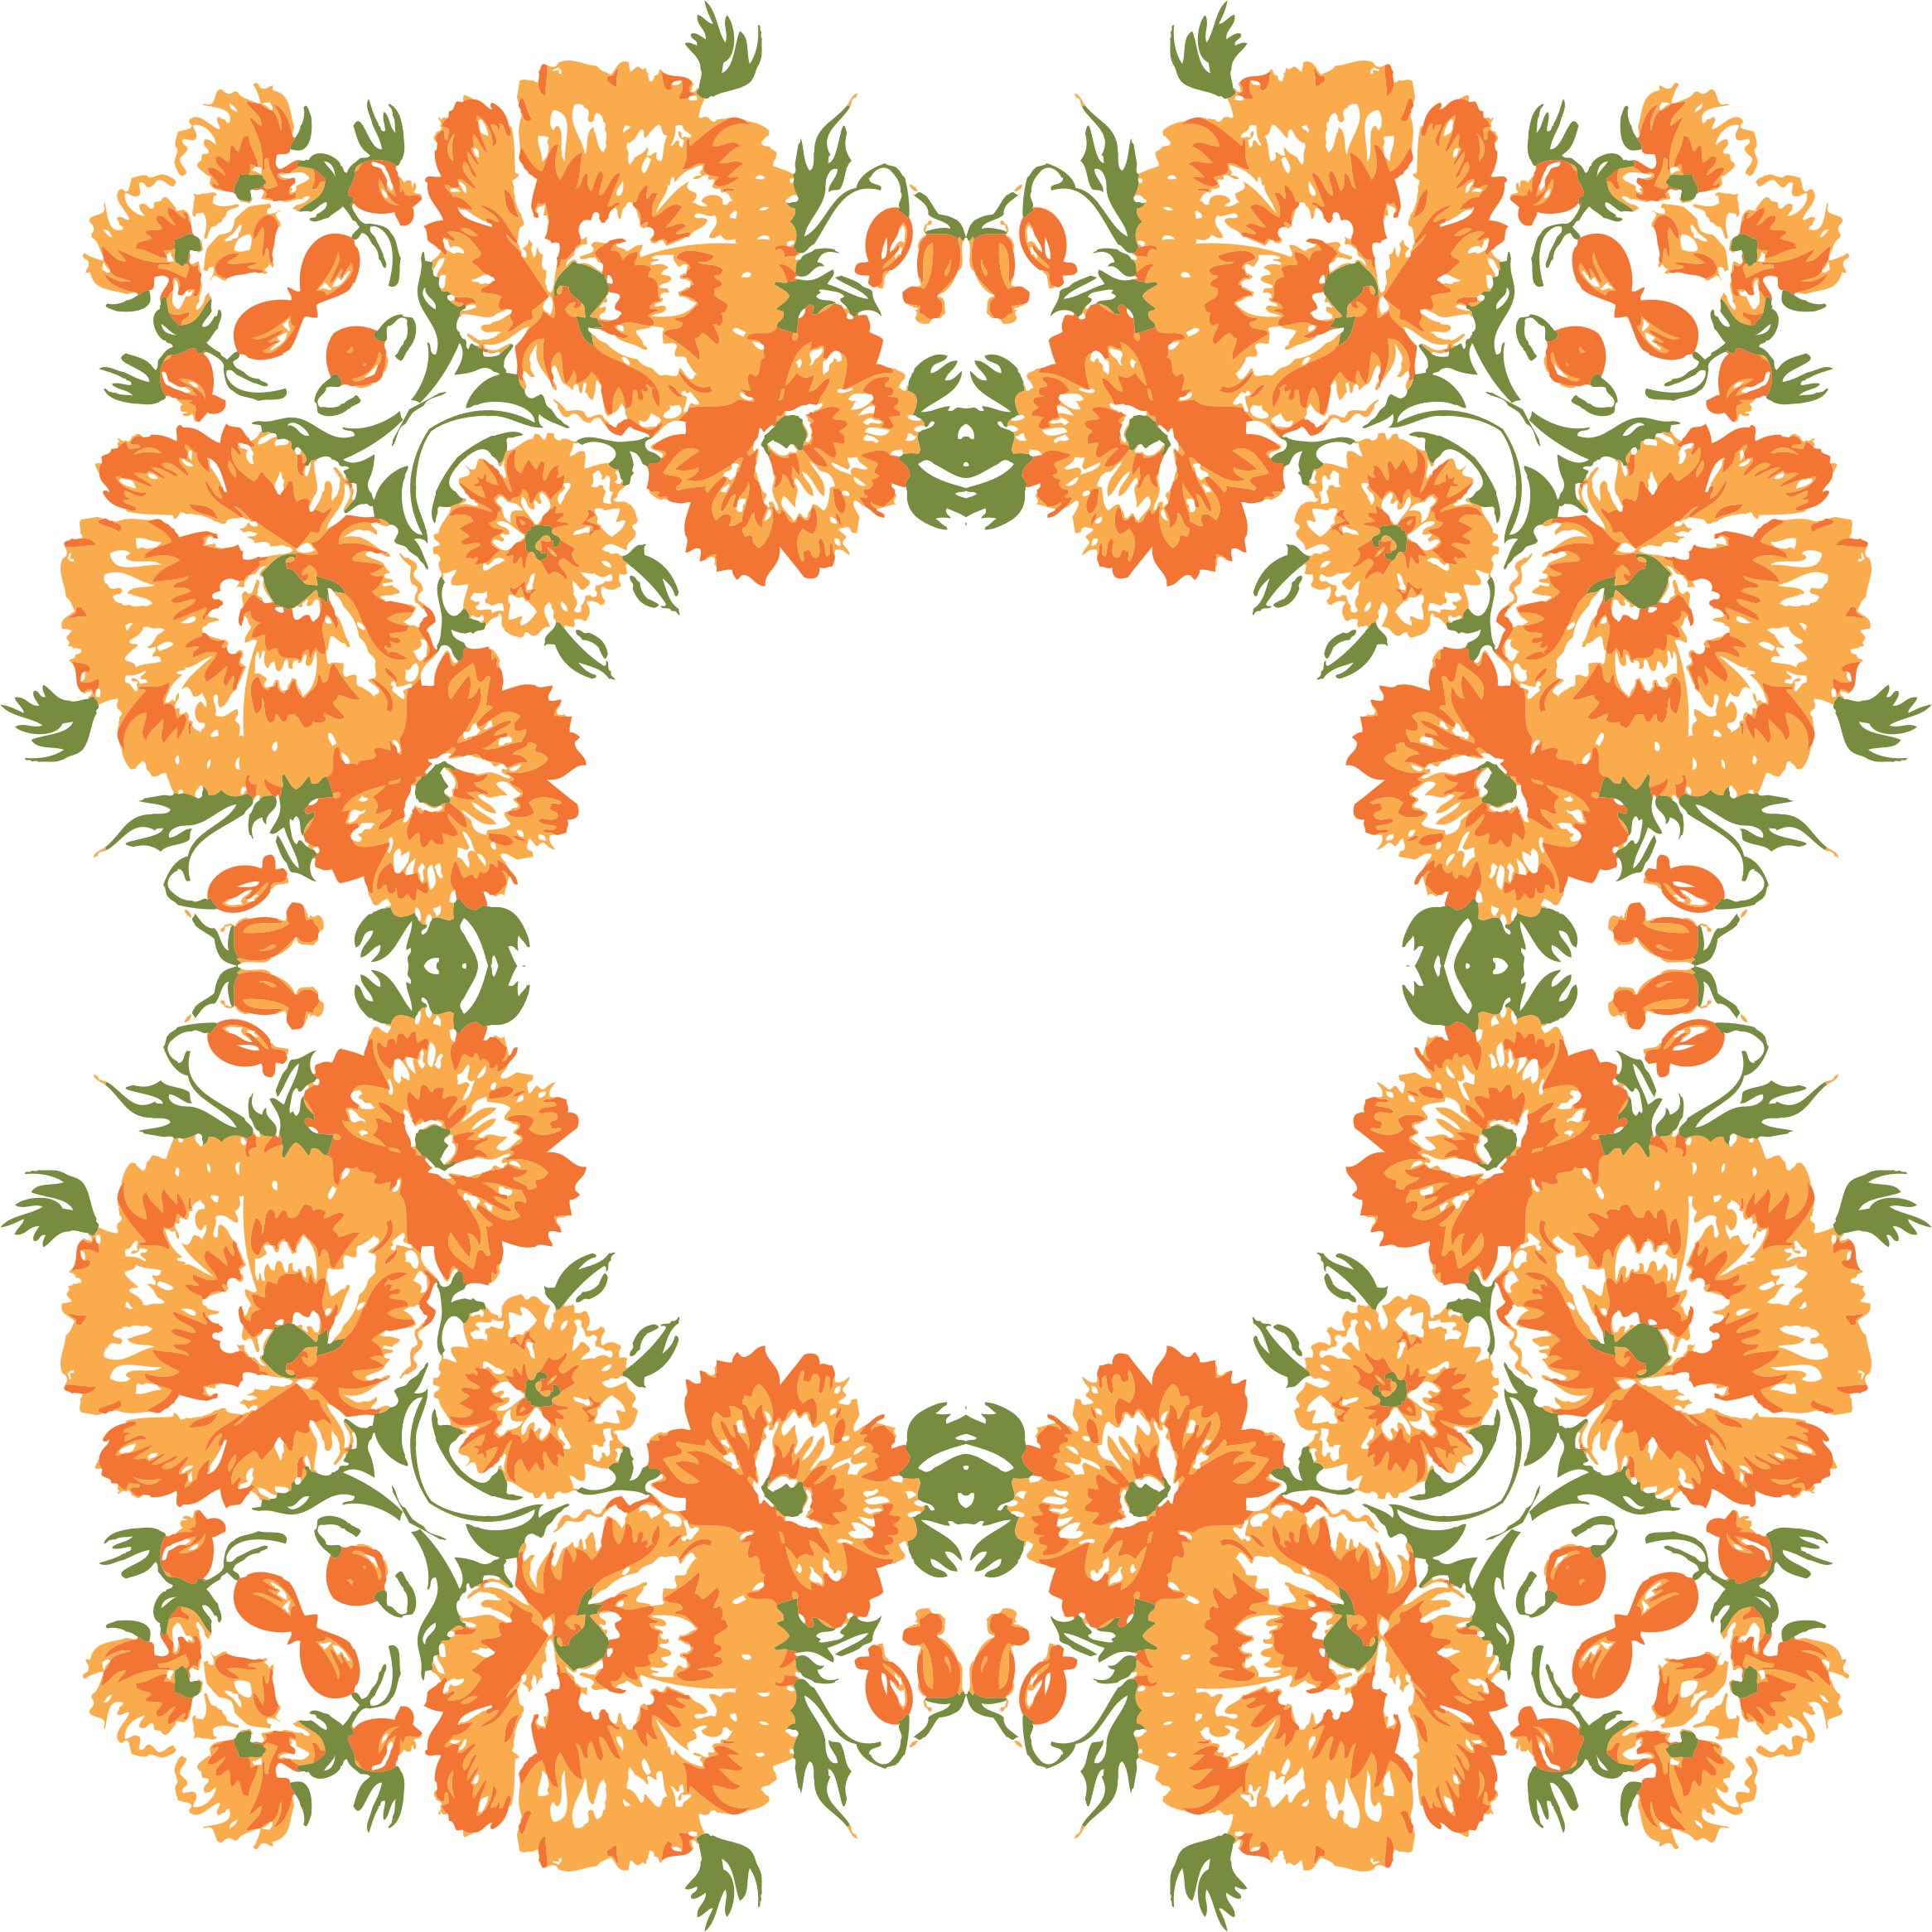 transparent stock Floral wreath clipart. Frame big image png